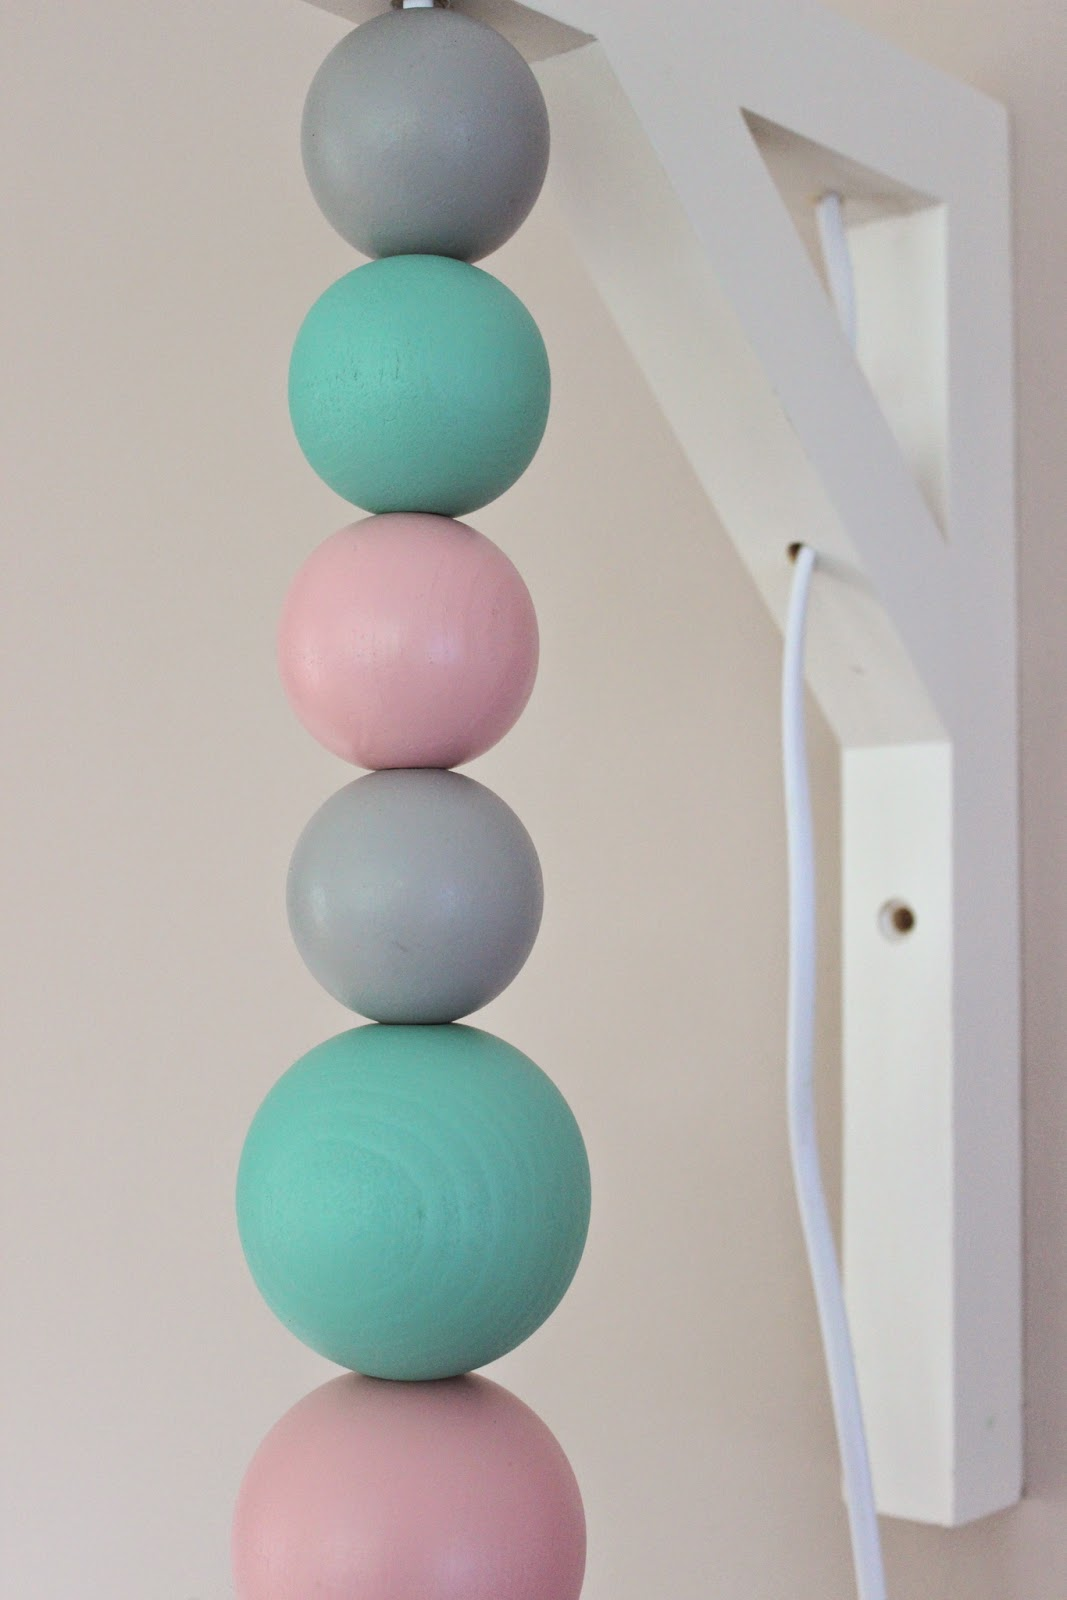 pfefferminzgruen diy lampe mit holzkugeln. Black Bedroom Furniture Sets. Home Design Ideas